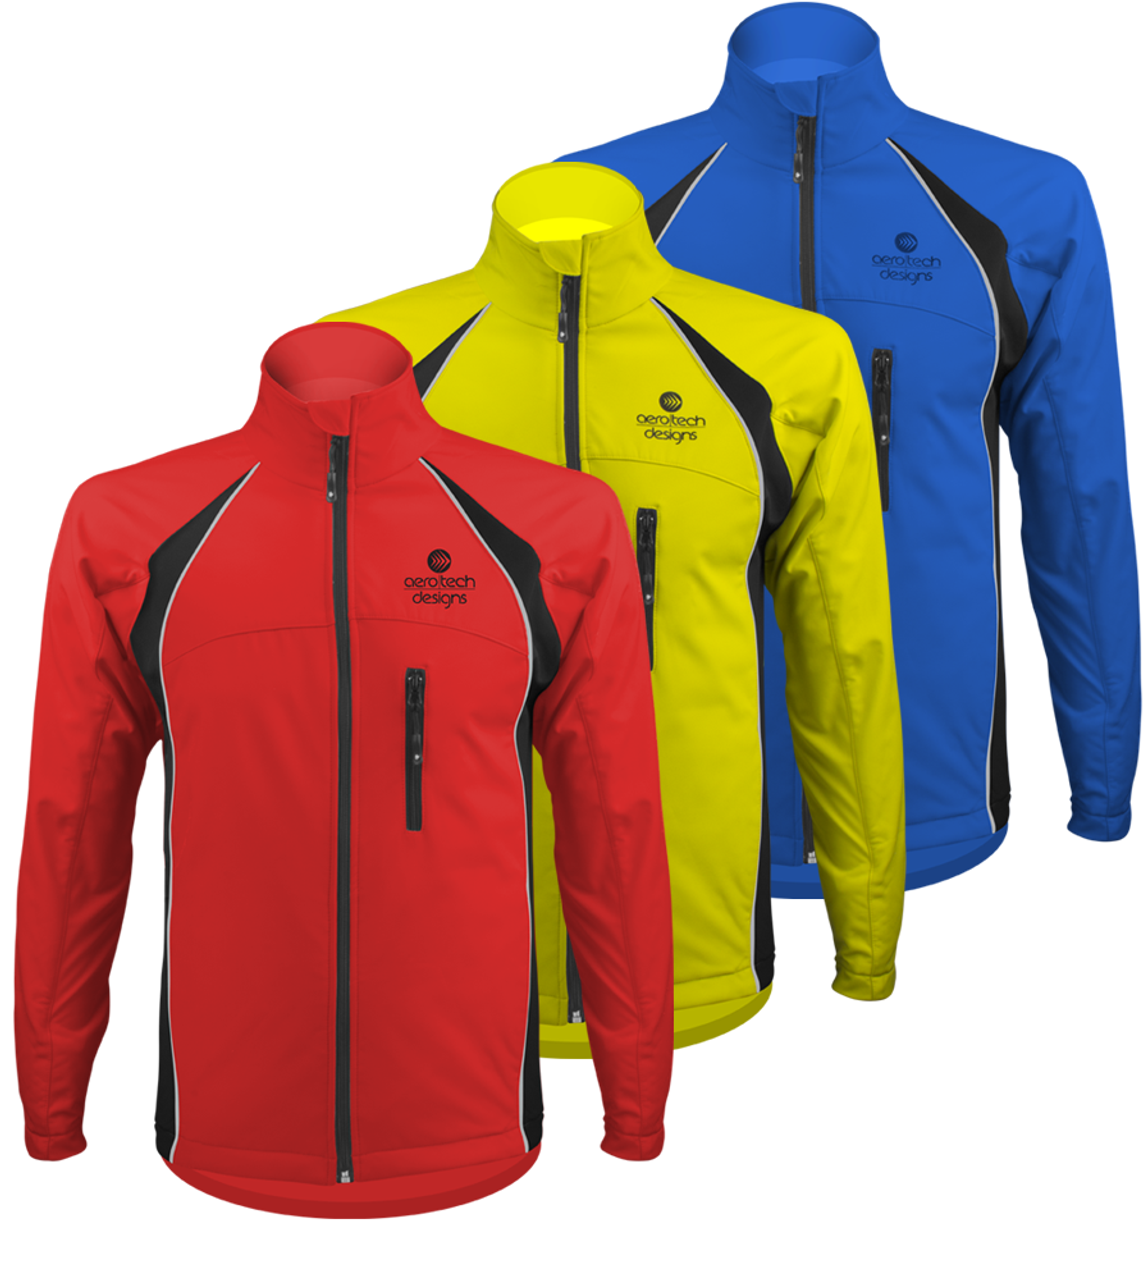 Aero Tech Designs Men S Windproof Thermal Cycling Jacket